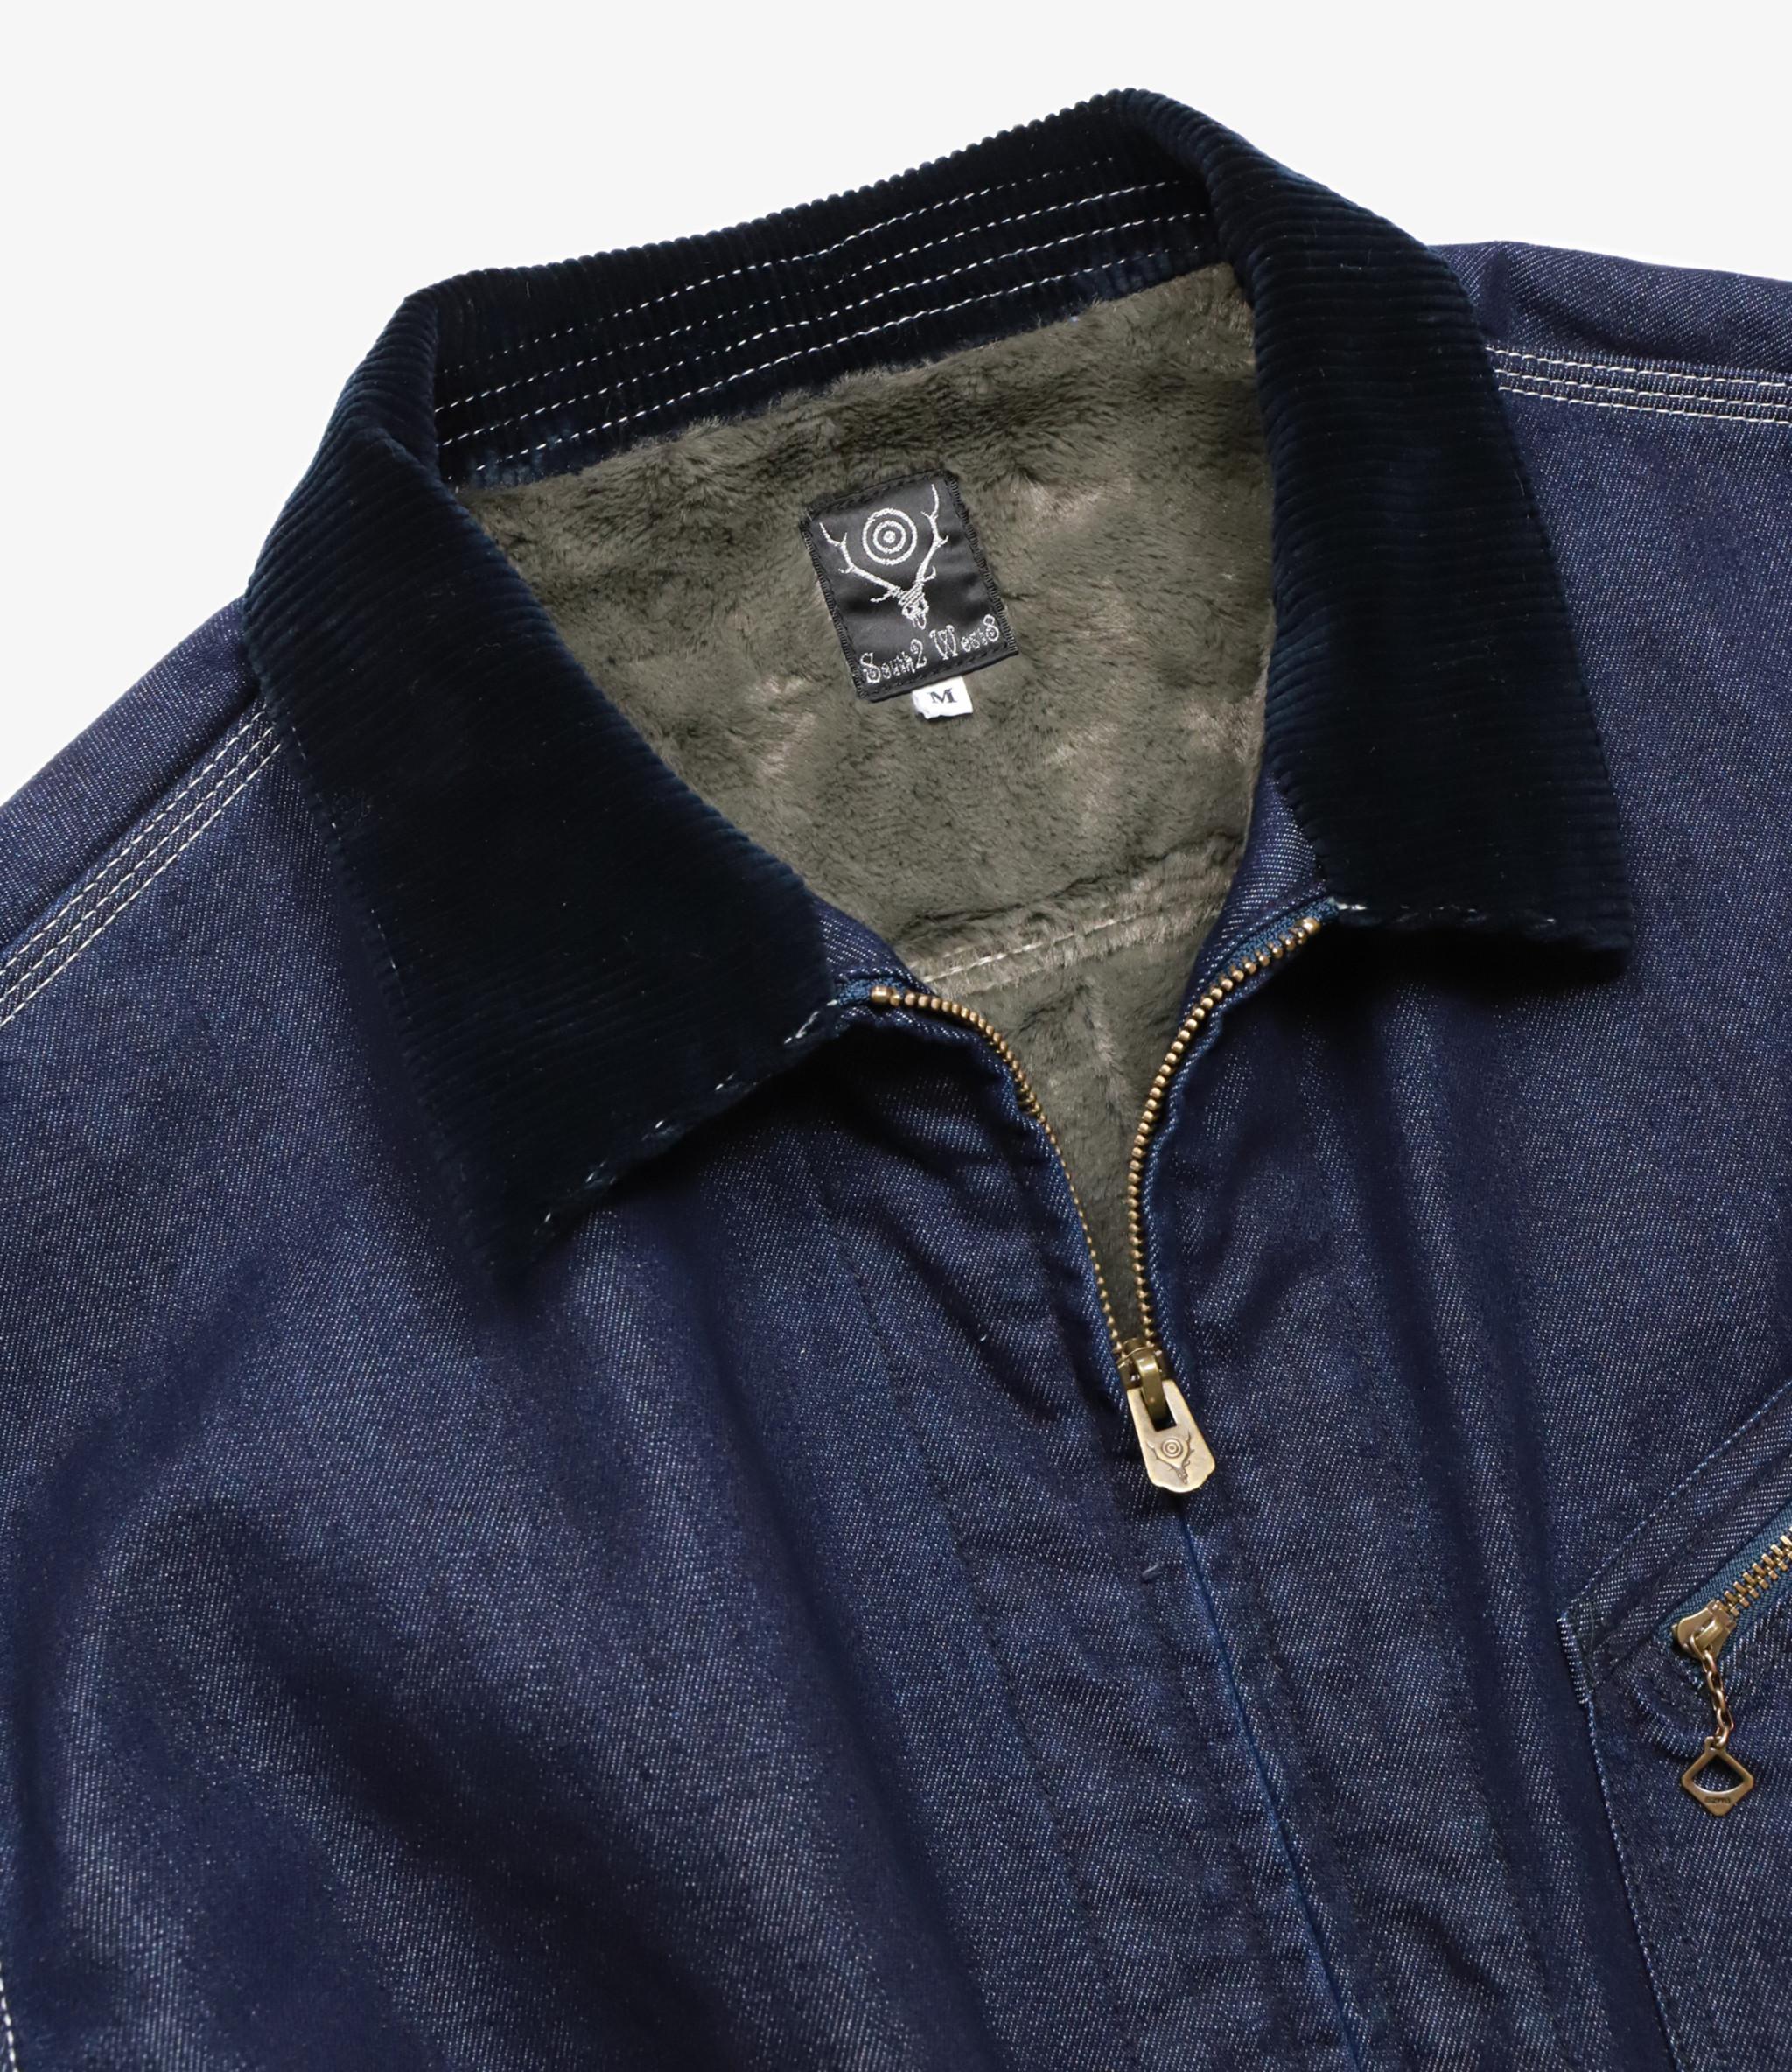 South2 West8 Lined Work Jacket - Cordura Nylon 11oz Denim - Indigo